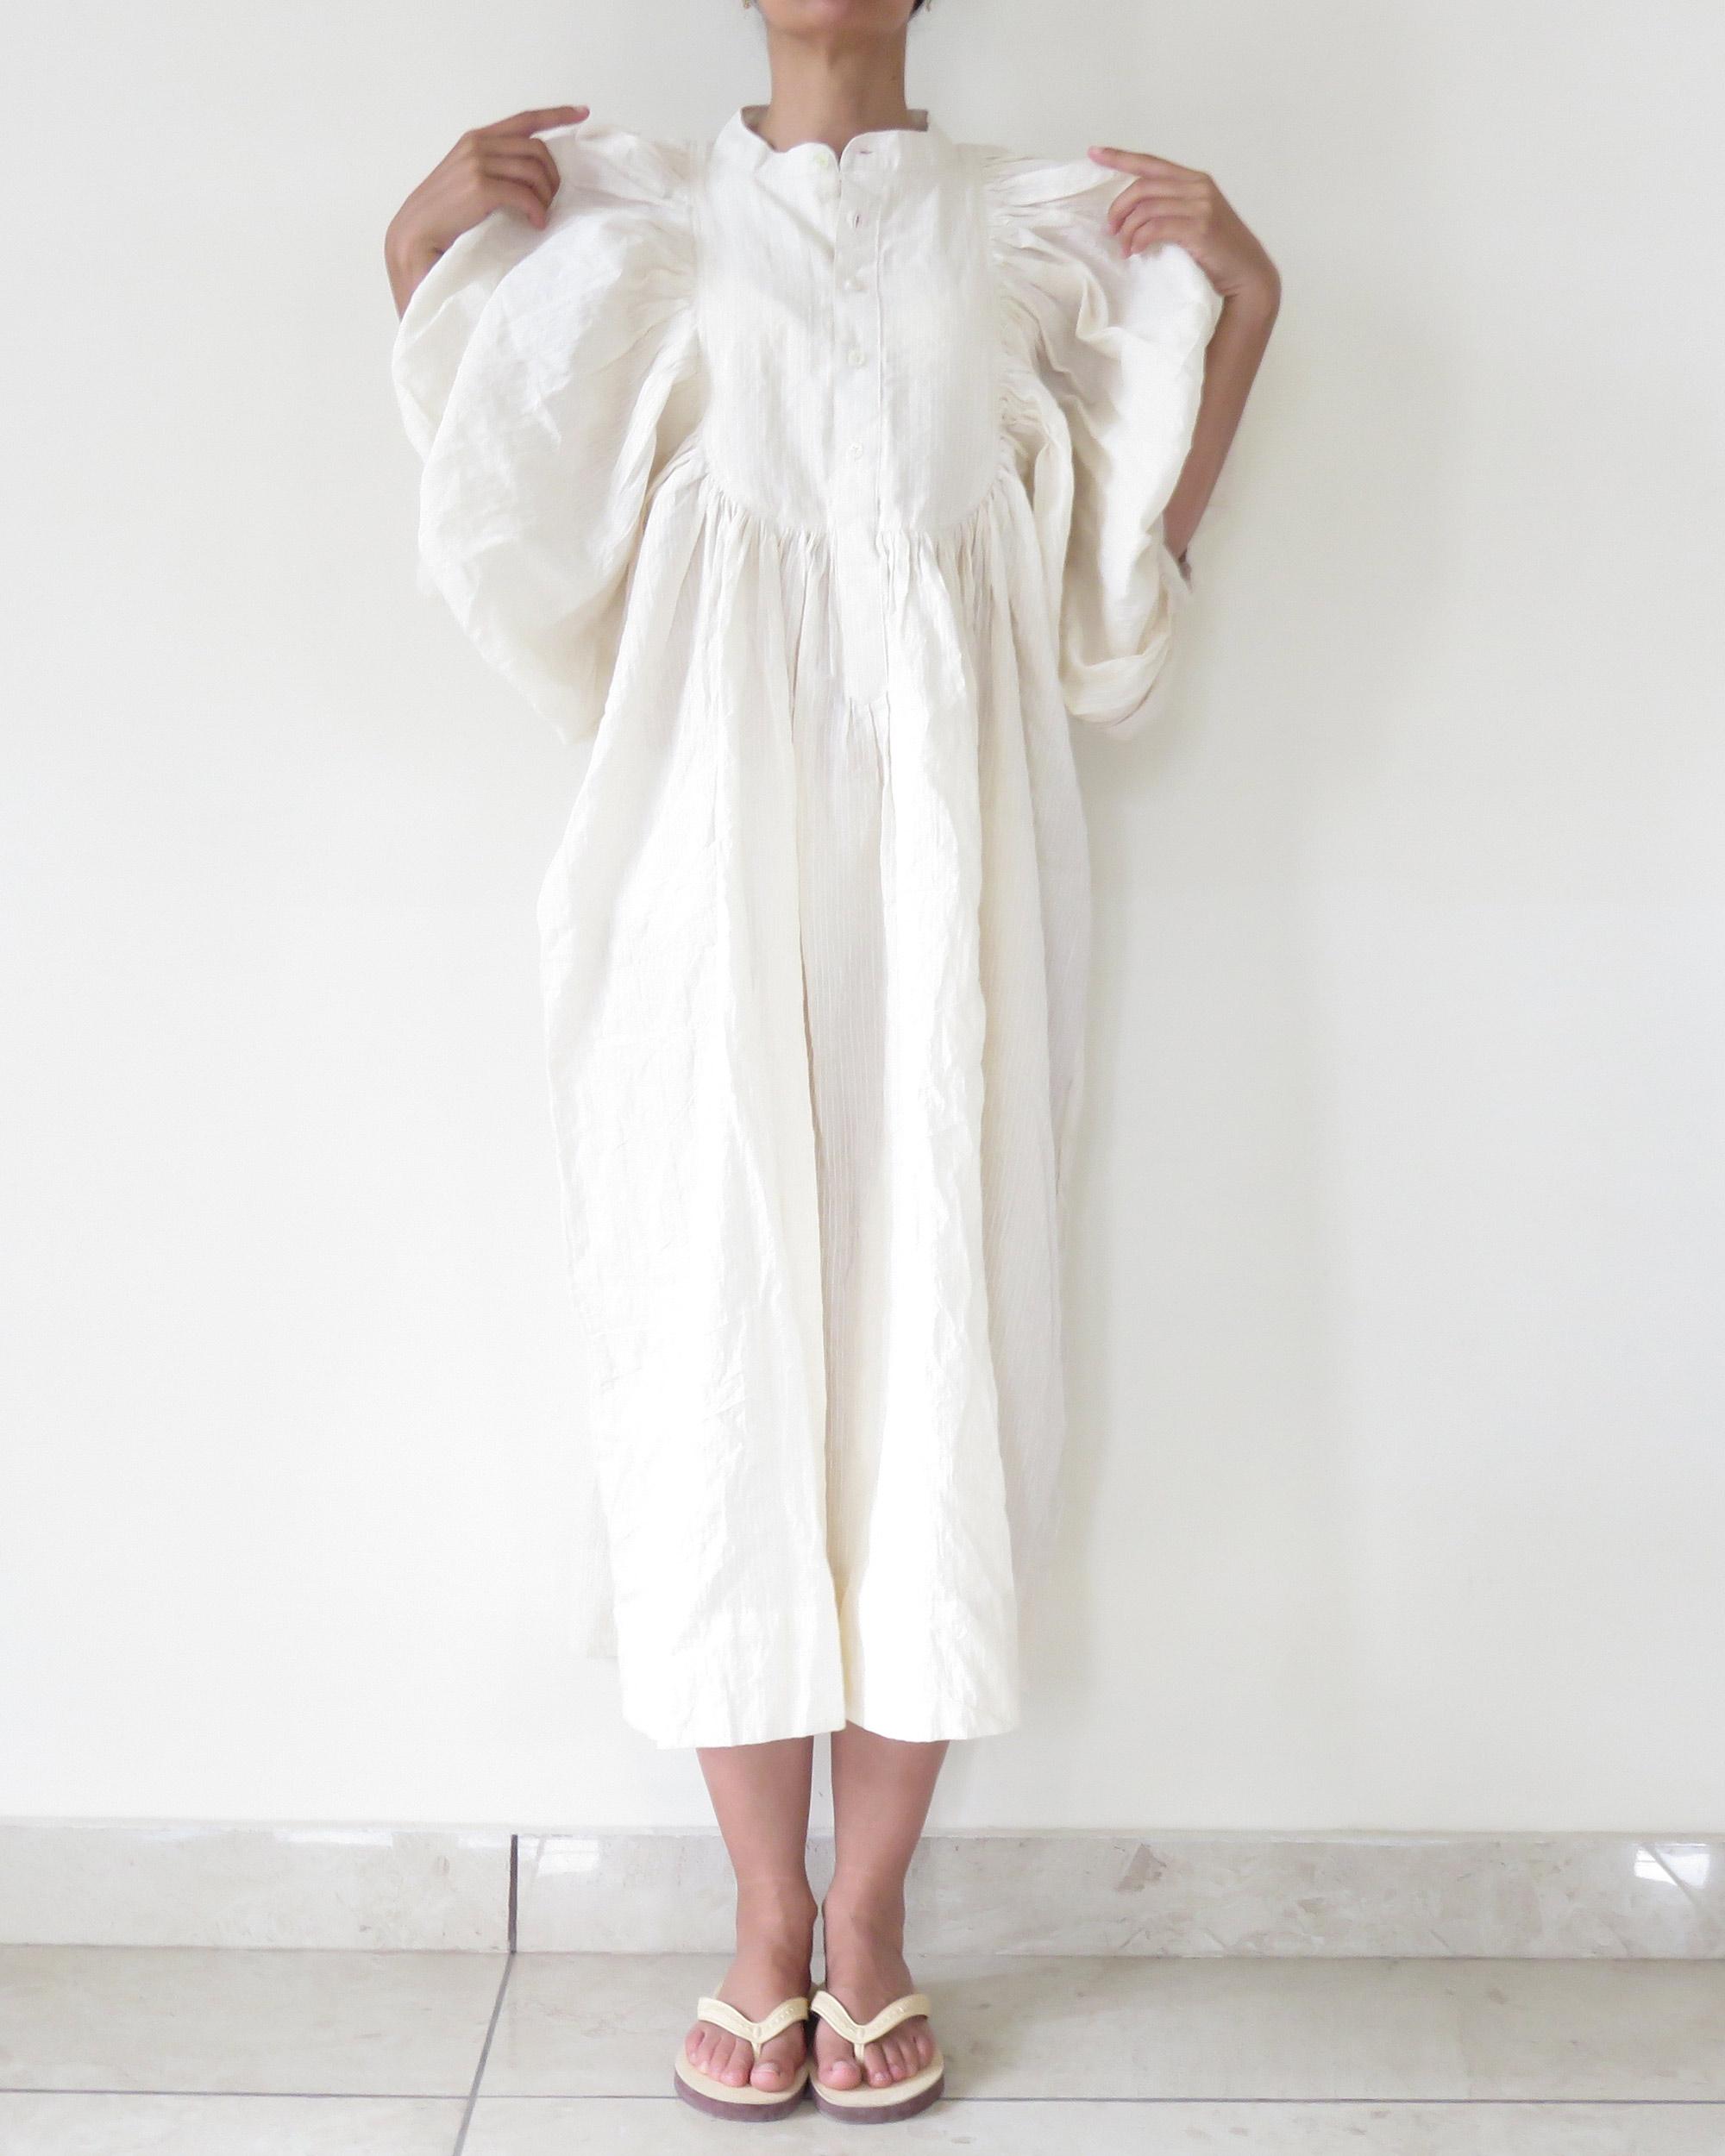 ASHA CREAM COTTON DRESS